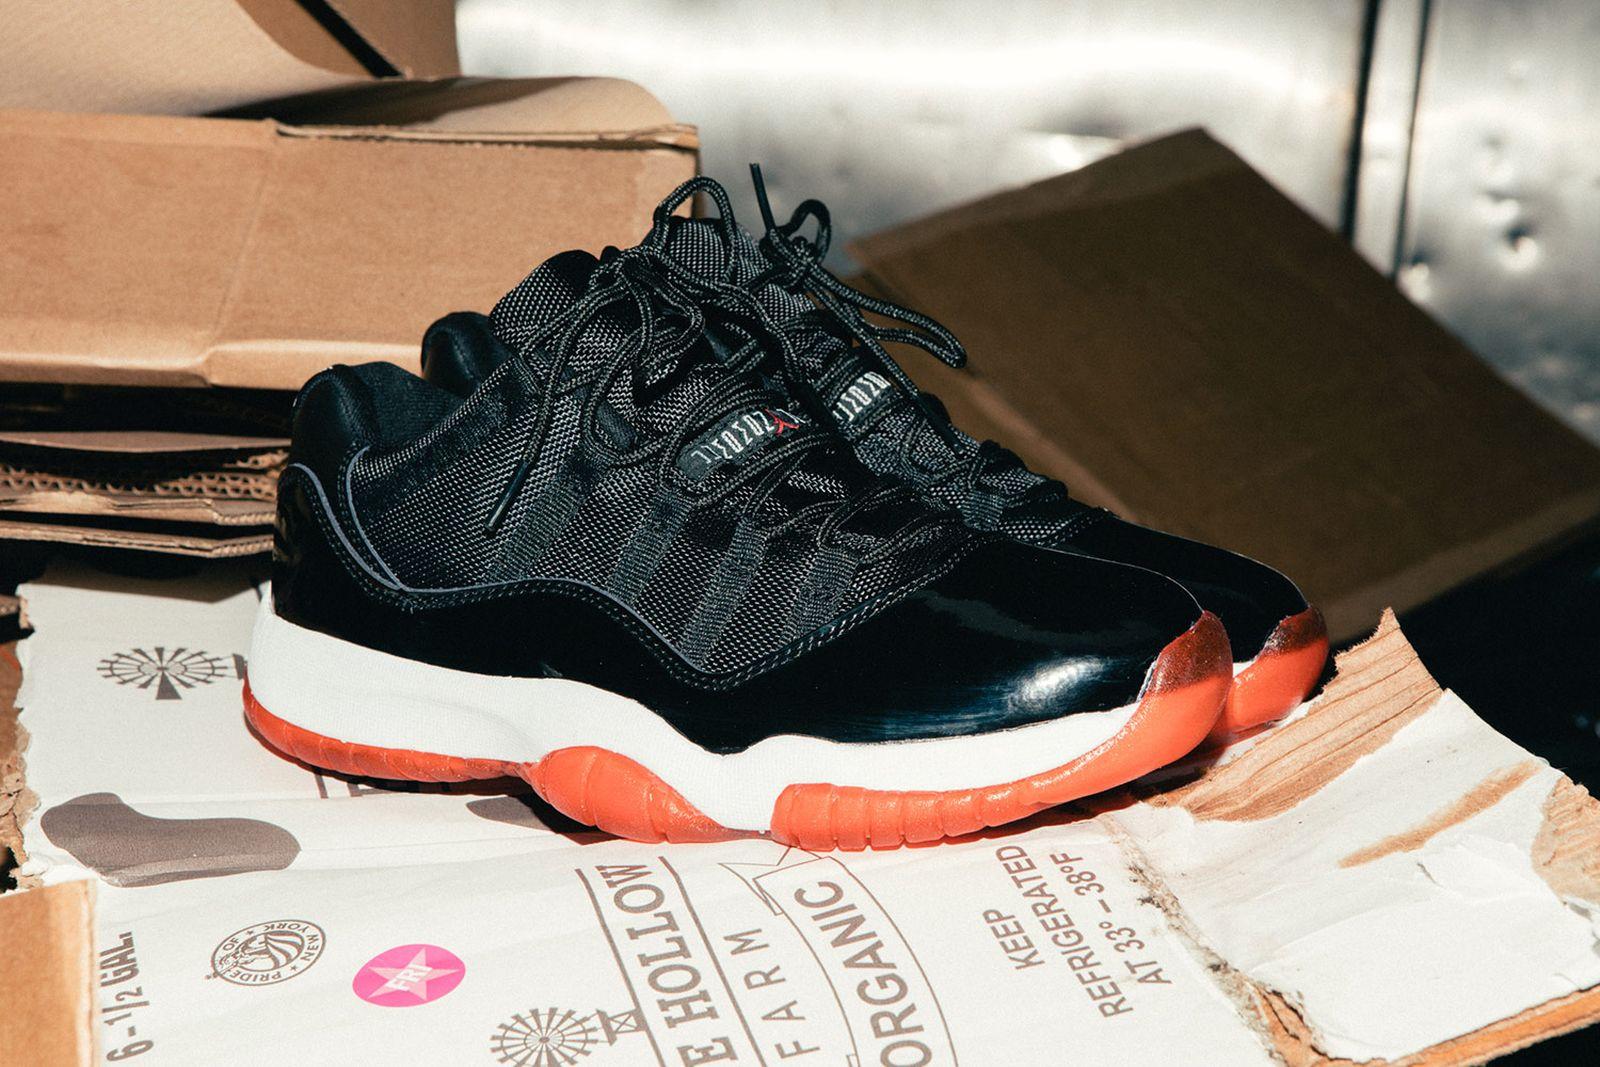 Legit-Check-Fake-Sneakers-Highsnobiety-18